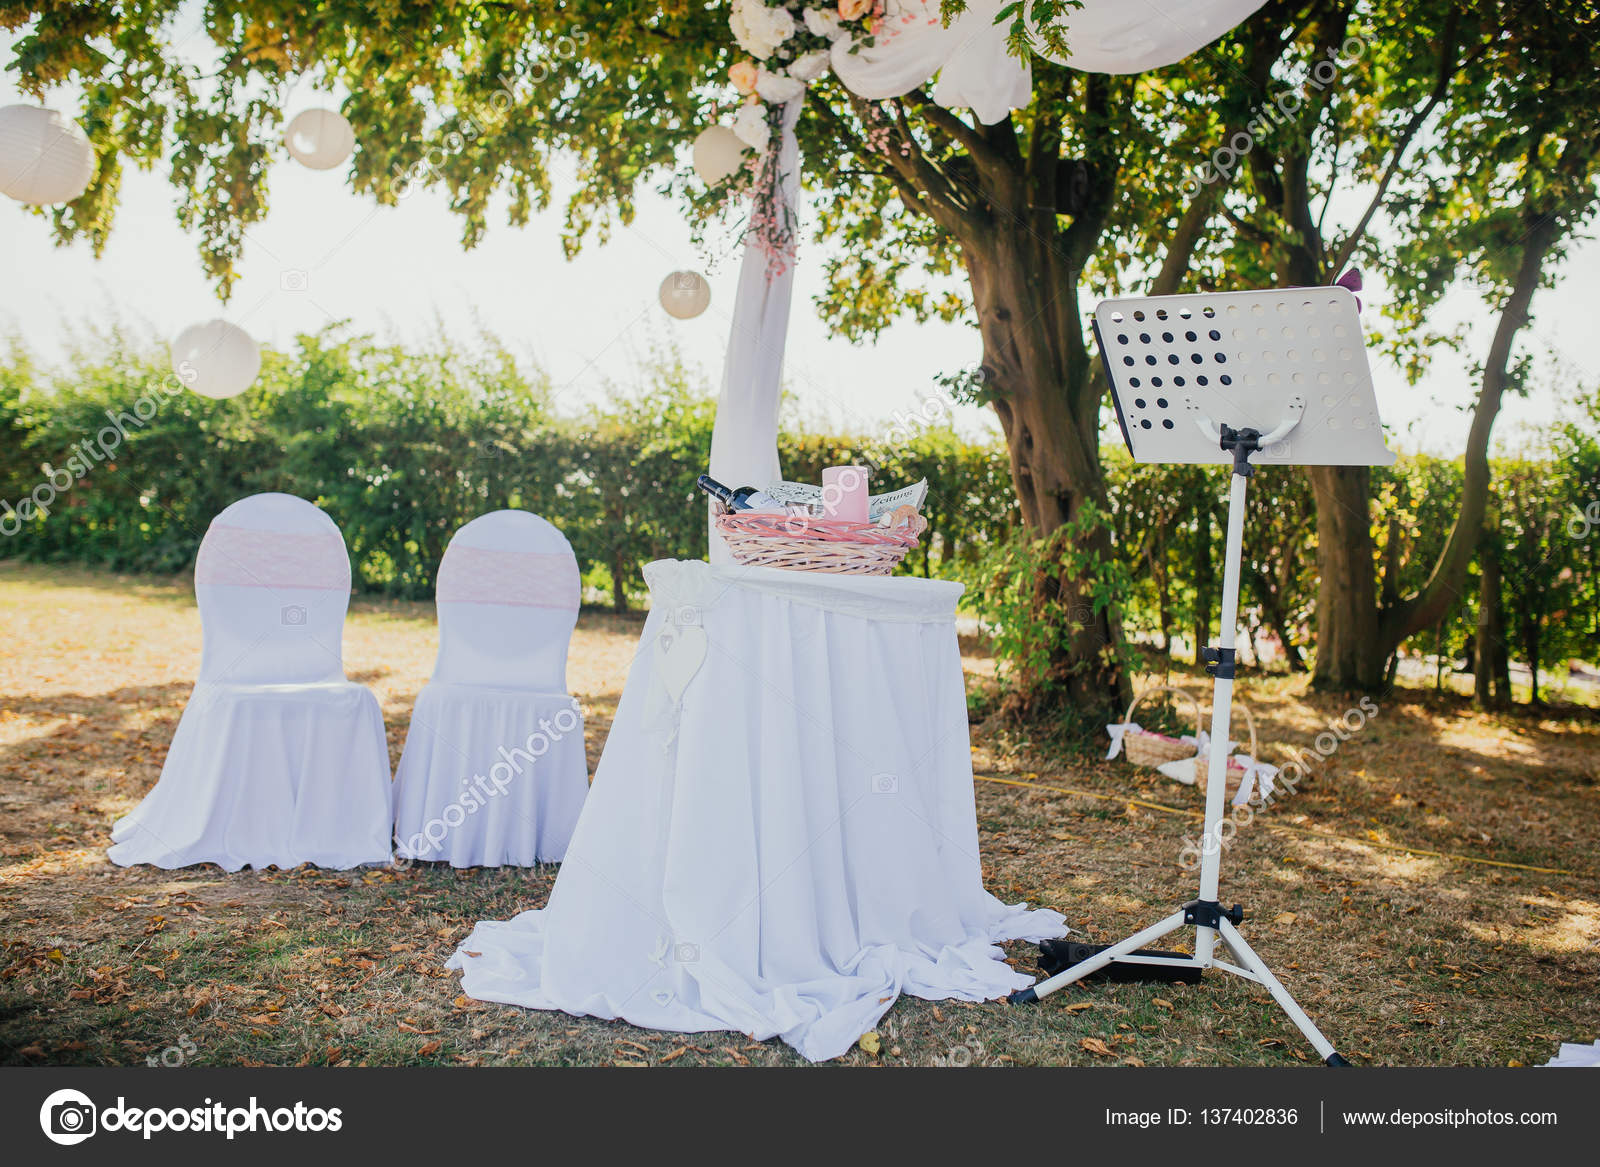 Wedding decor outdoor indoor stock photo lelik83 137402836 wedding decor outdoor indoor stock photo junglespirit Gallery